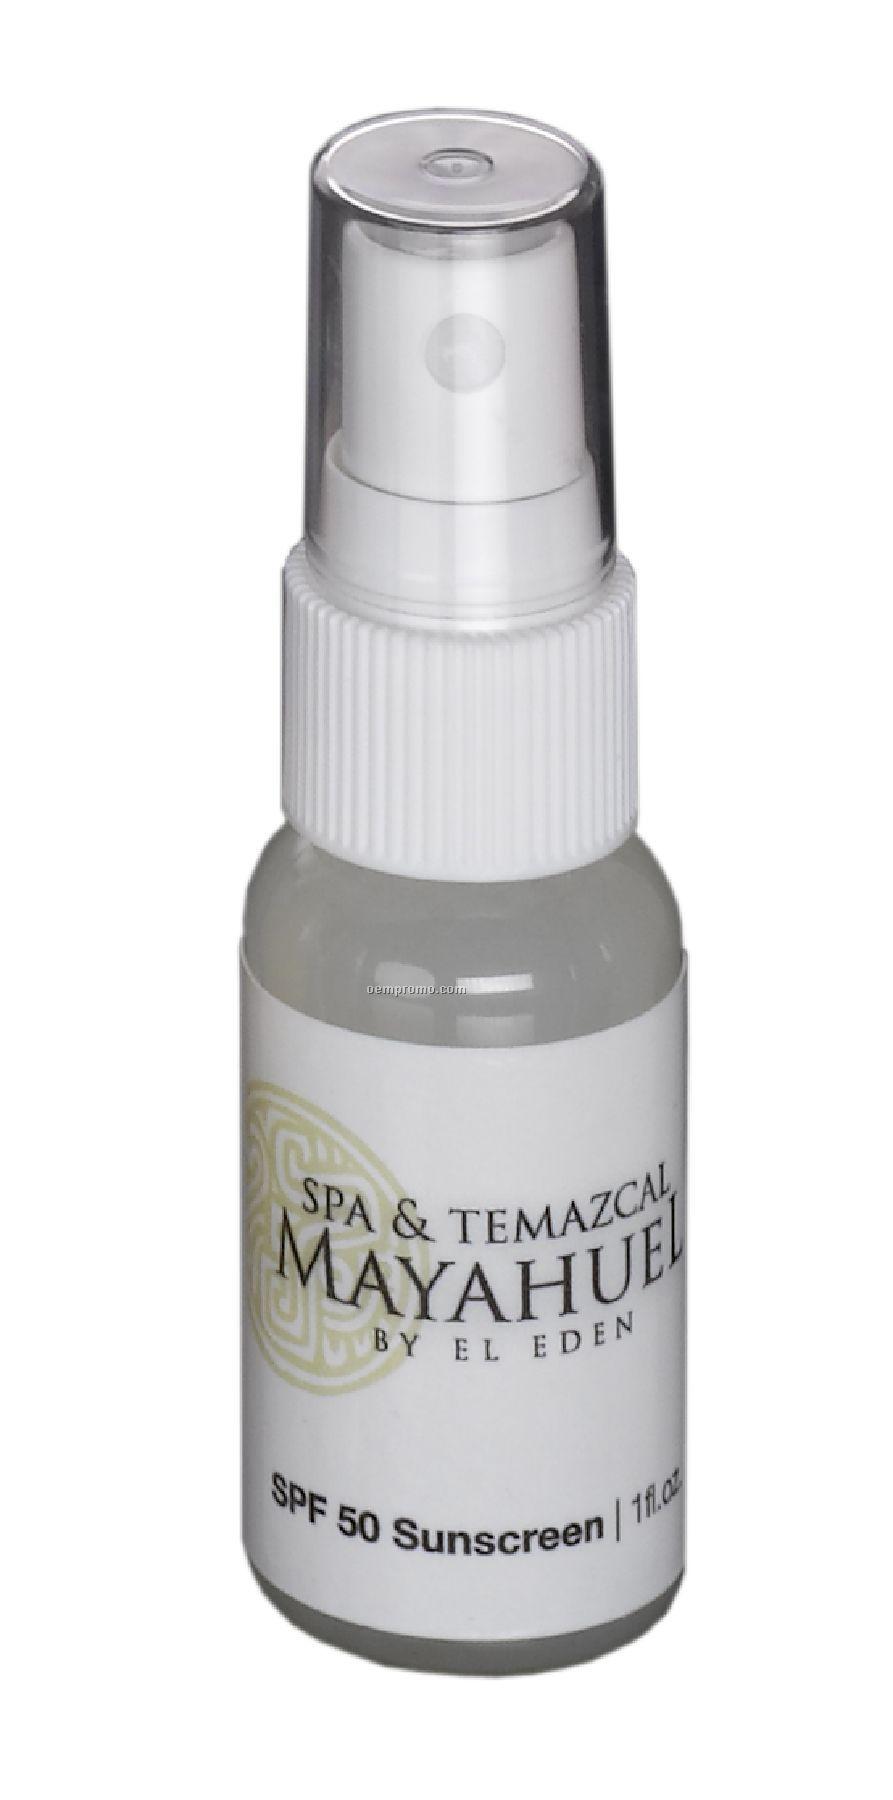 1 Oz. Spf 50 Spray Sunscreen